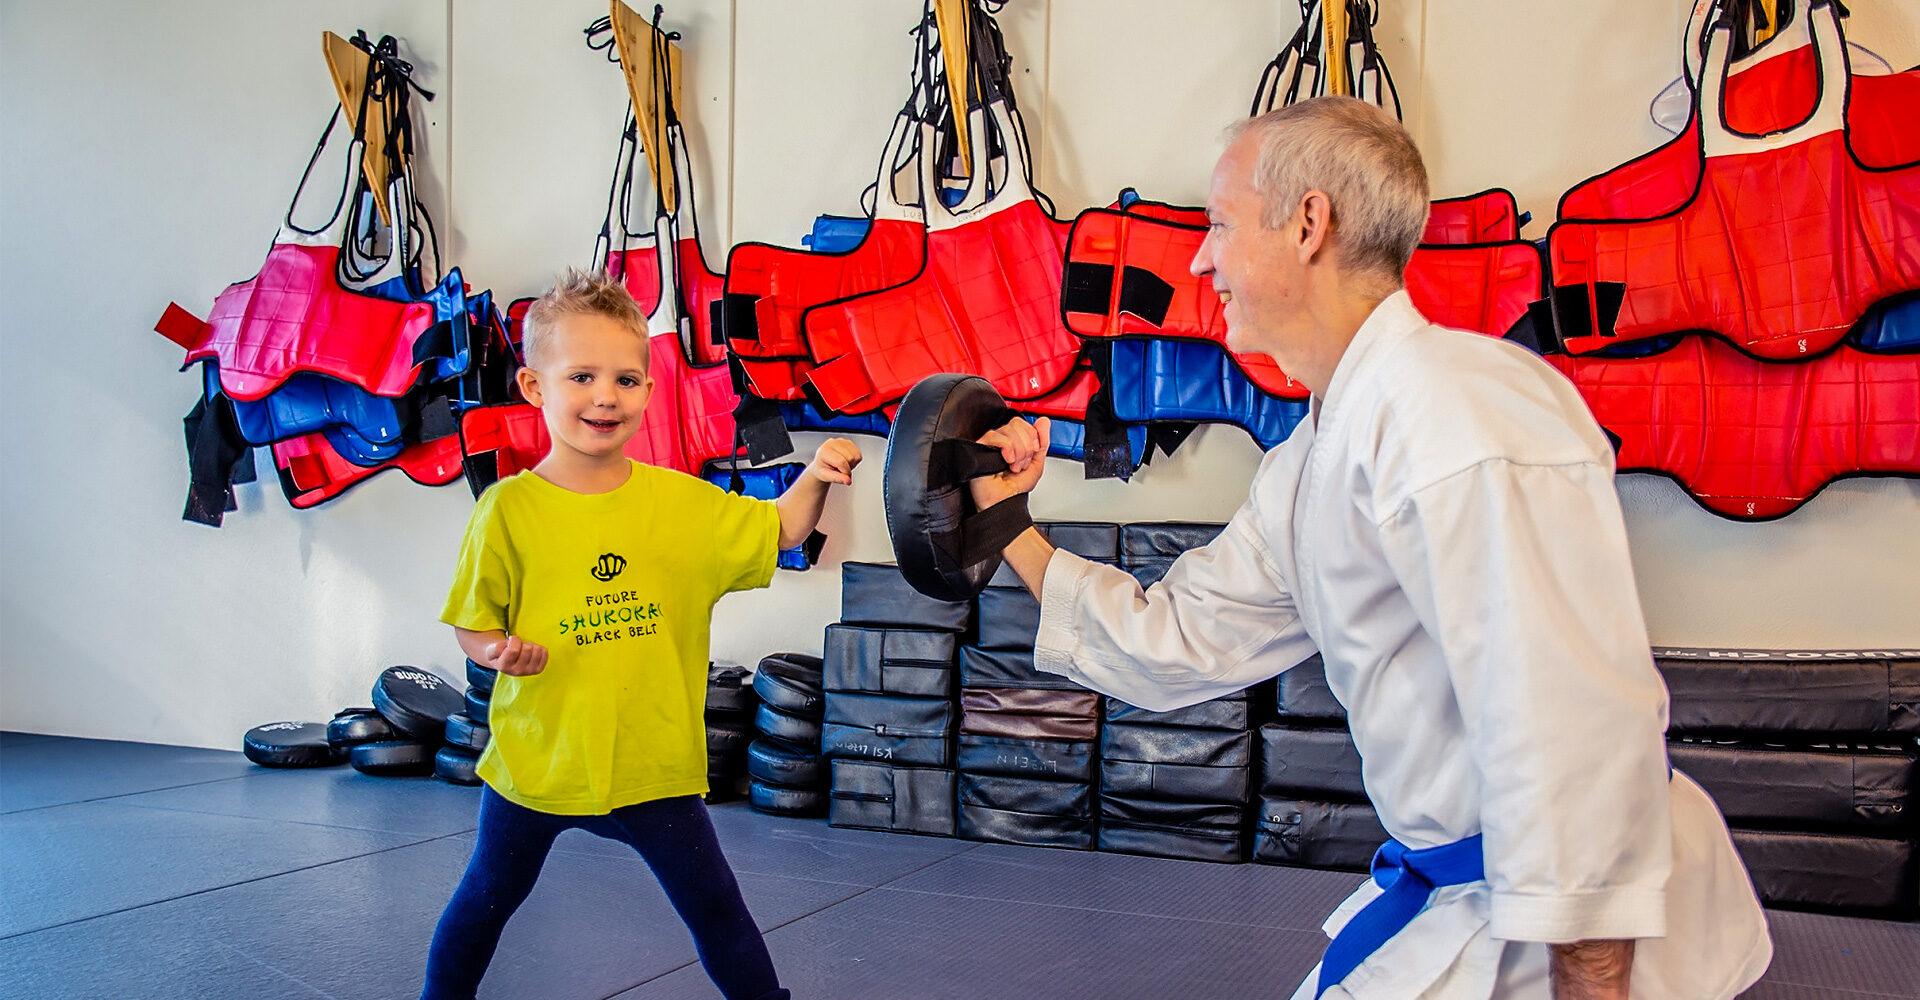 Pre-Bonsai Karate | Karateschule Kimura Shukokai Luzern